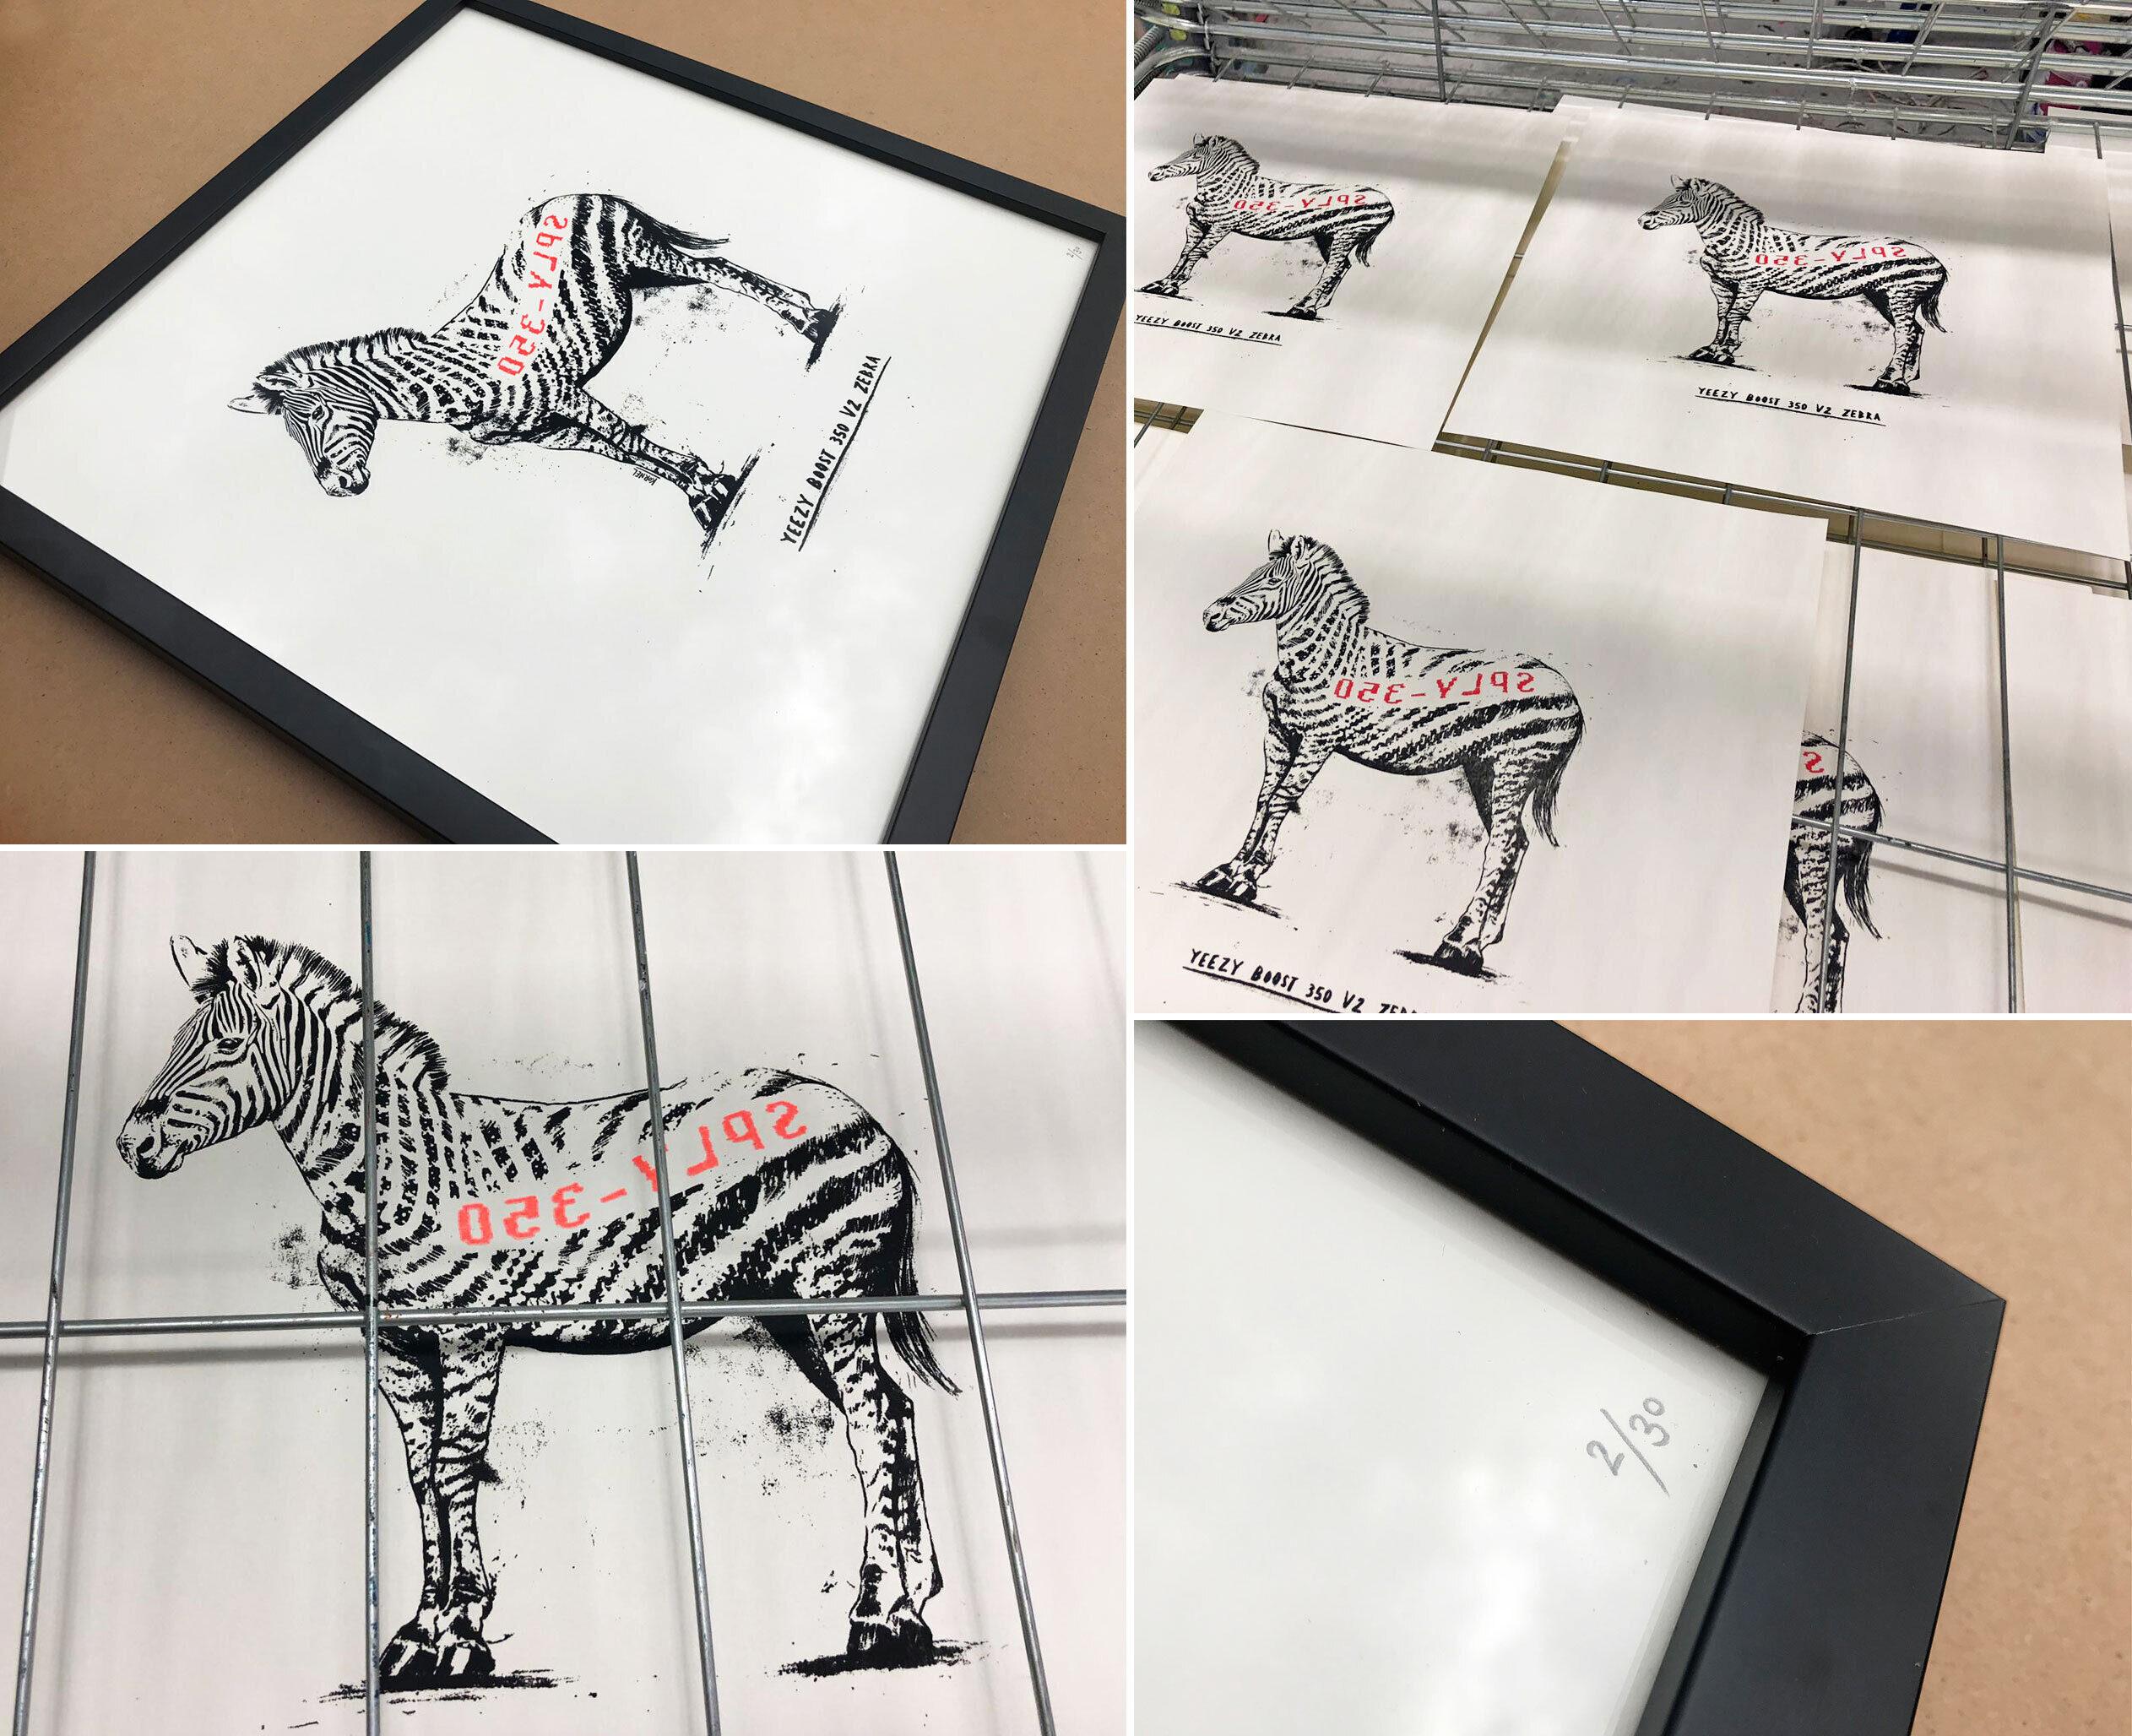 Yeezy siebdruck - Kornel Illustration | Kornel Stadler portfolio